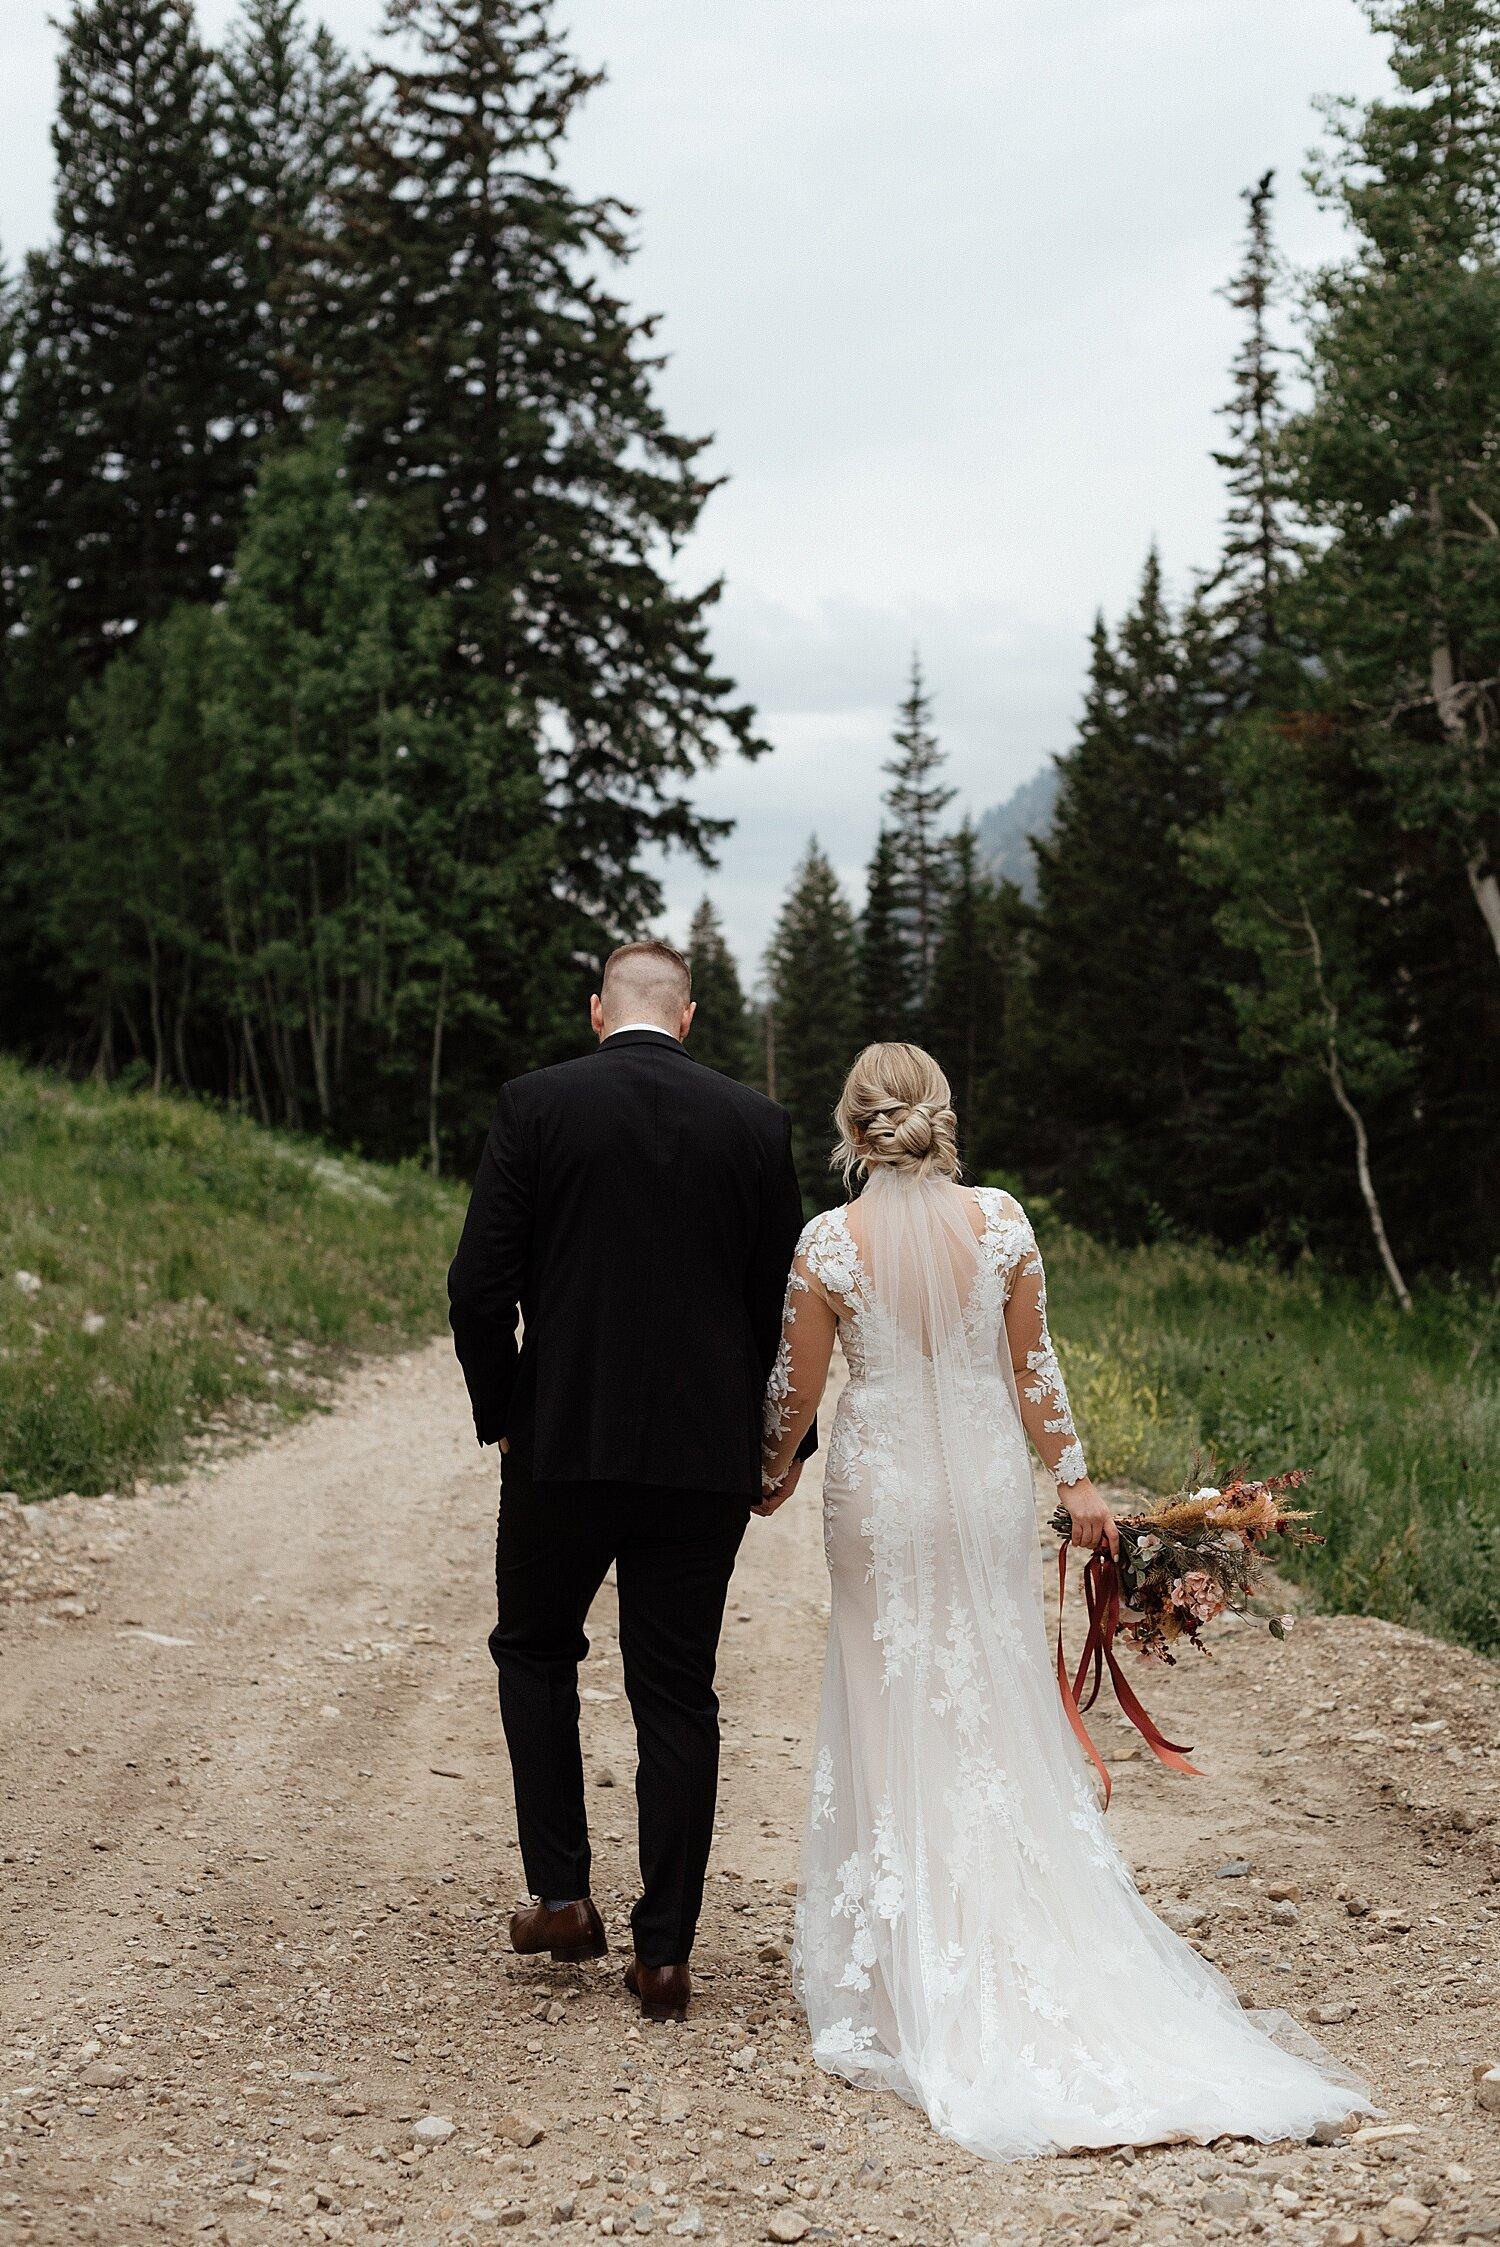 Zandra Barriga Photo - Hunter and Brighton Mountain Bridals_0009.jpg